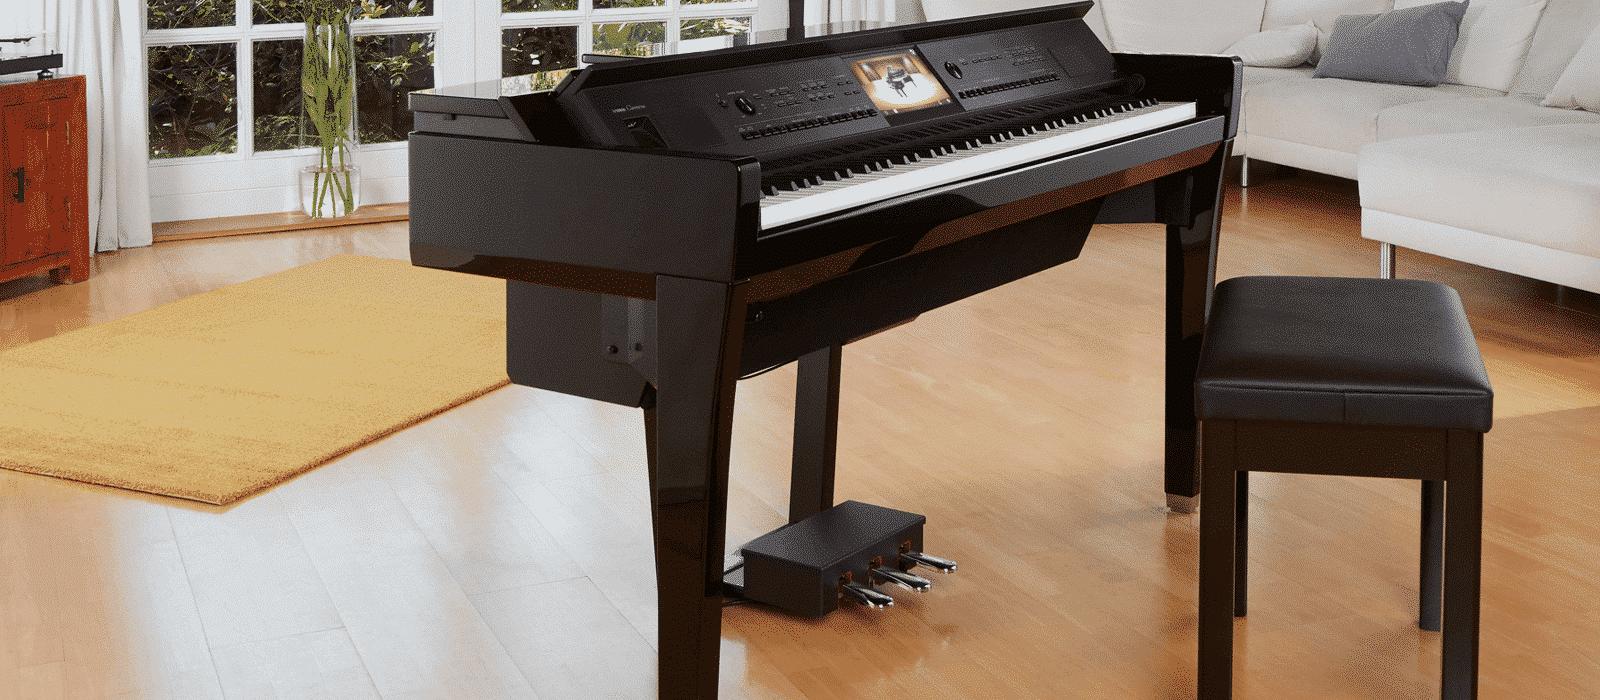 Yamaha cvp805